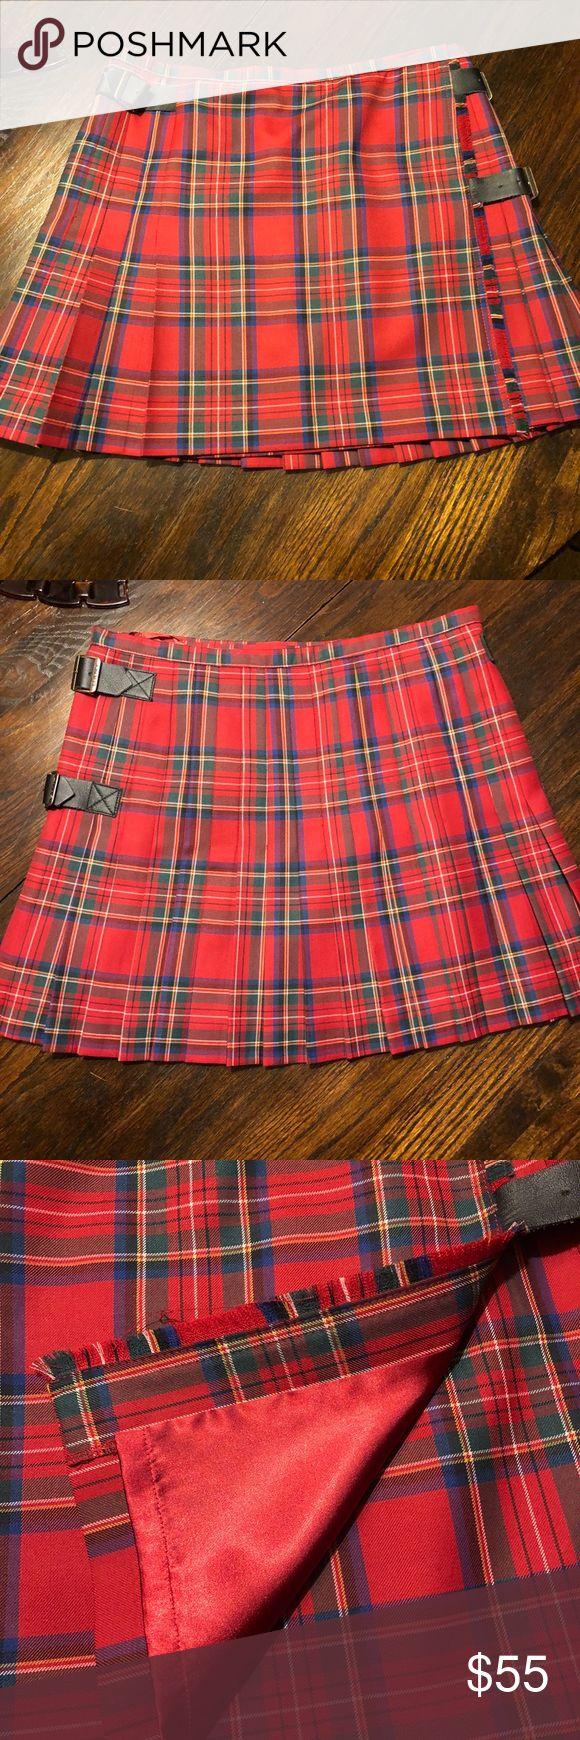 "Gant tartan skirt Gant tartan plaid wrap kilt skirt. Side fringe with leatherette buckle closure. Pleated around side and back. 16.5"" Long. Gant Skirts Mini"